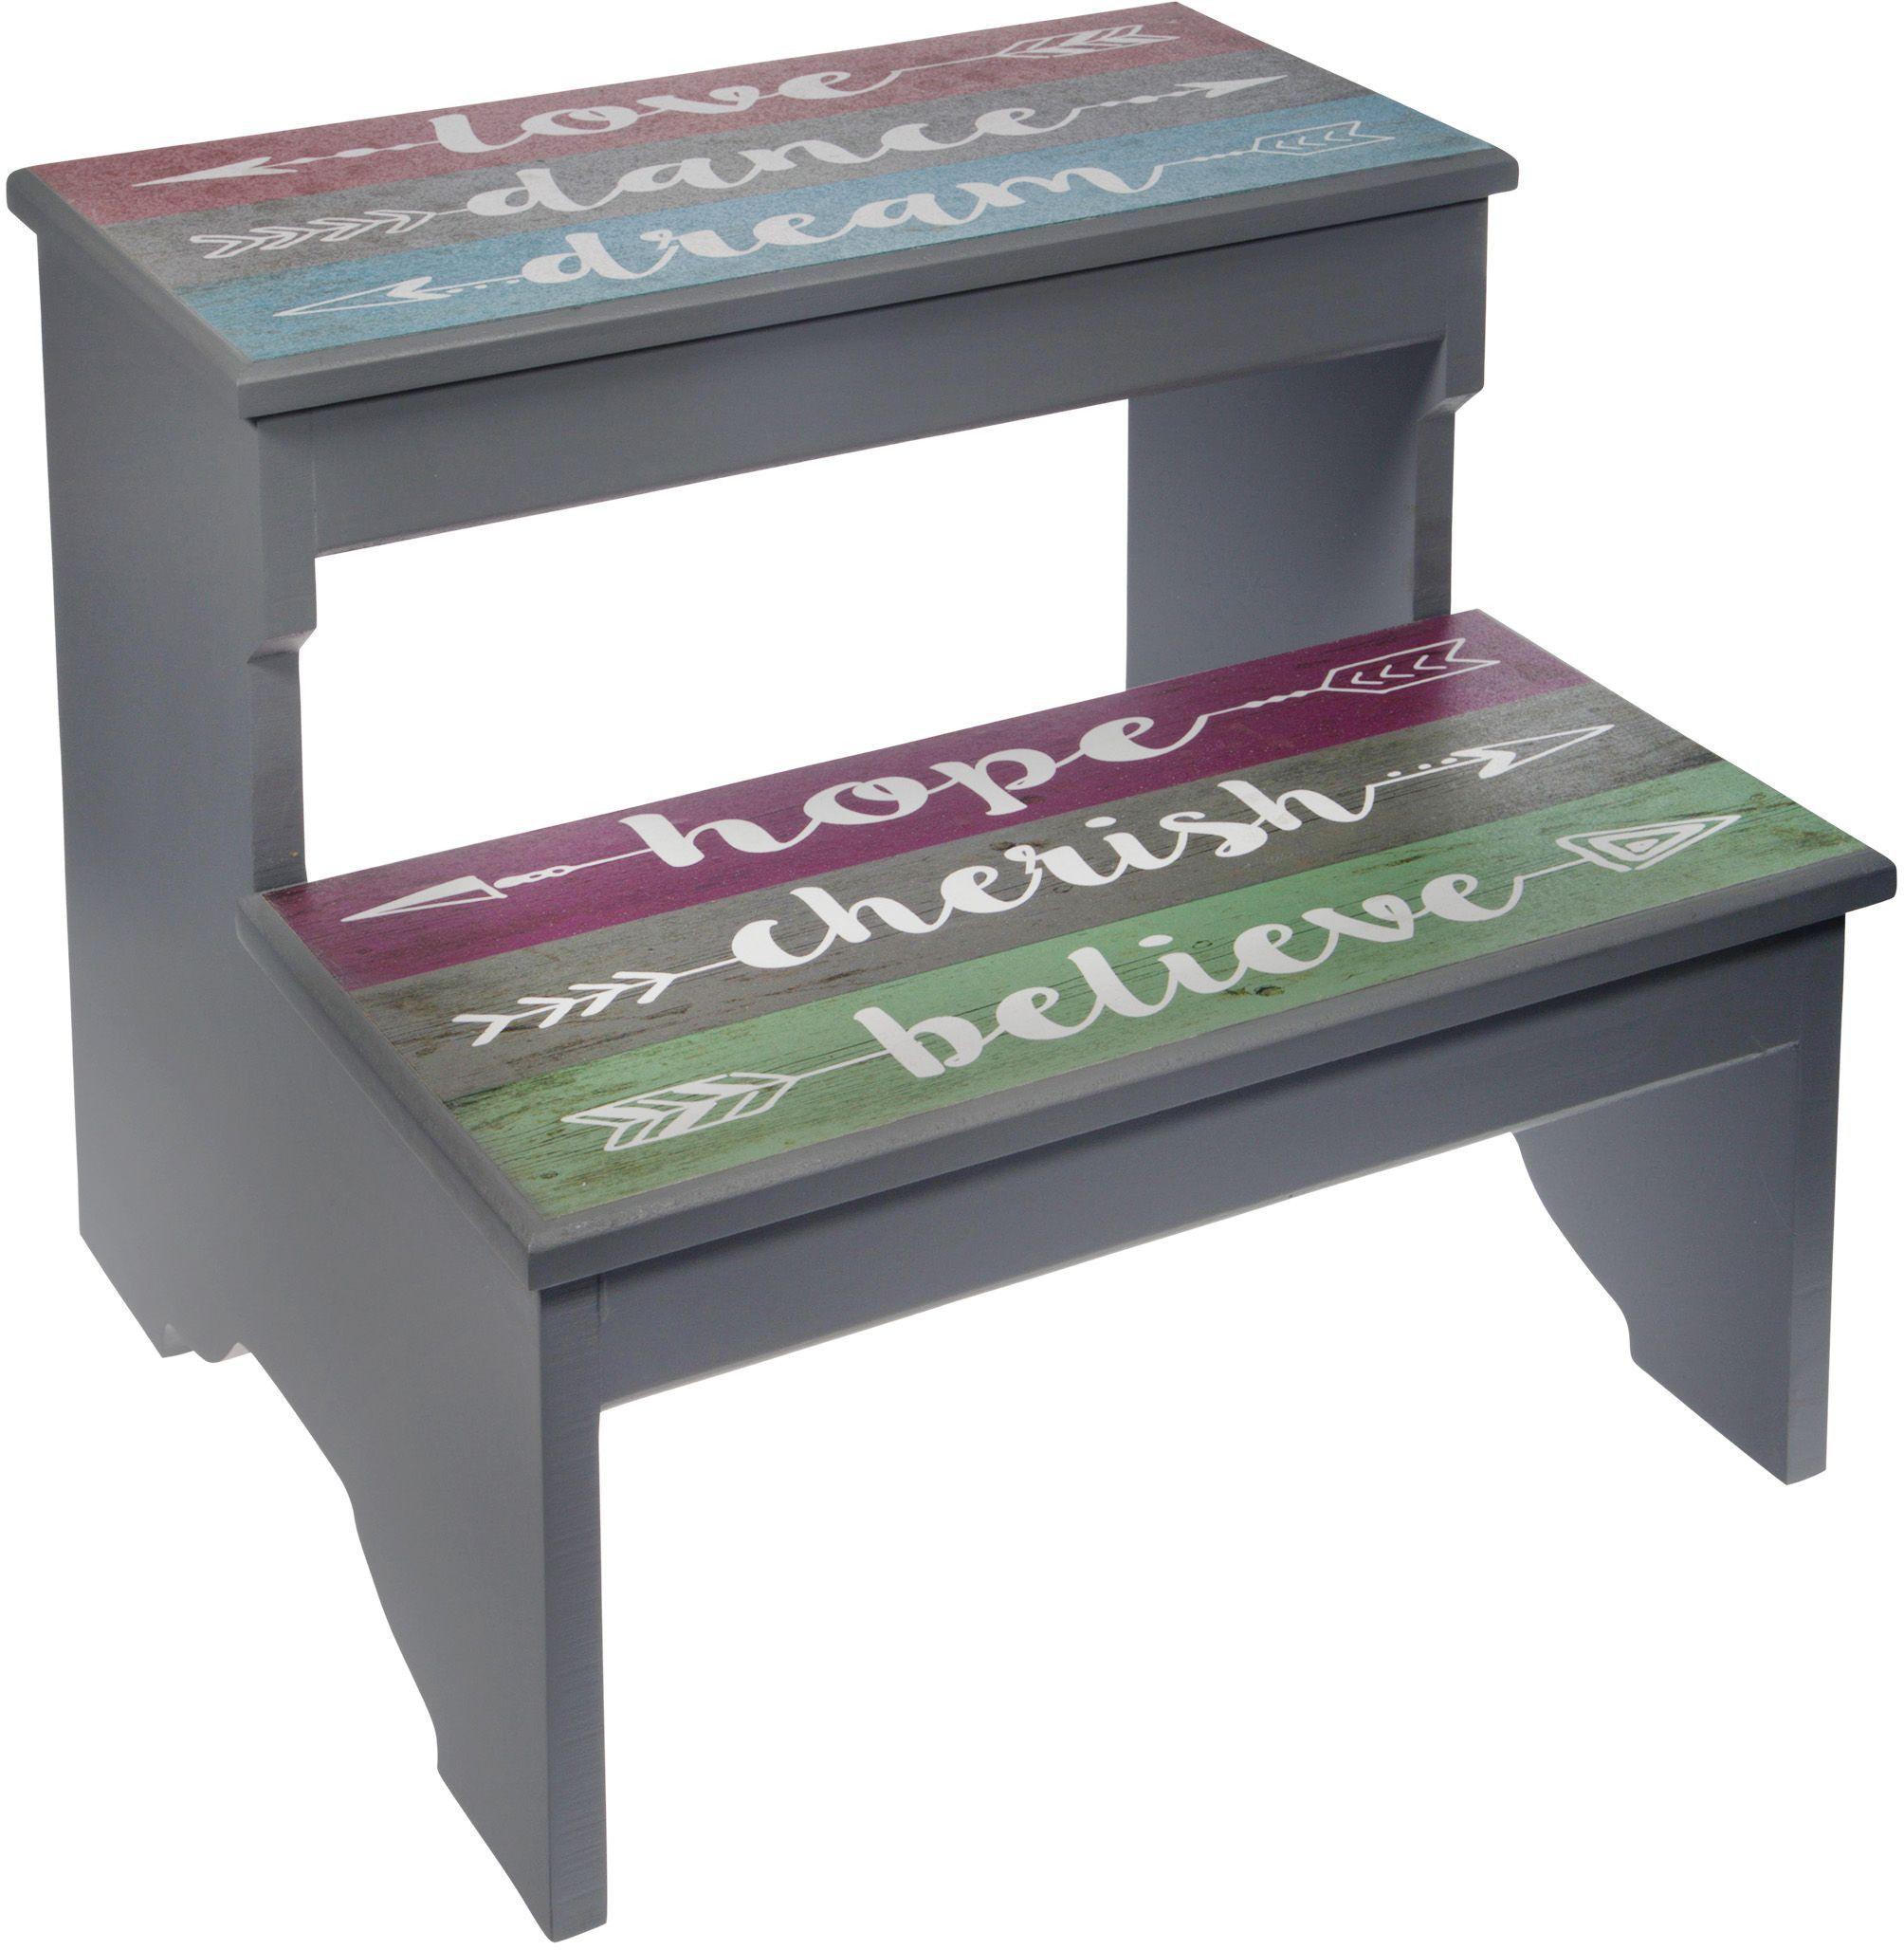 Astonishing Love Dance Dream Hope Cherish Believe Inspirational 2 Theyellowbook Wood Chair Design Ideas Theyellowbookinfo